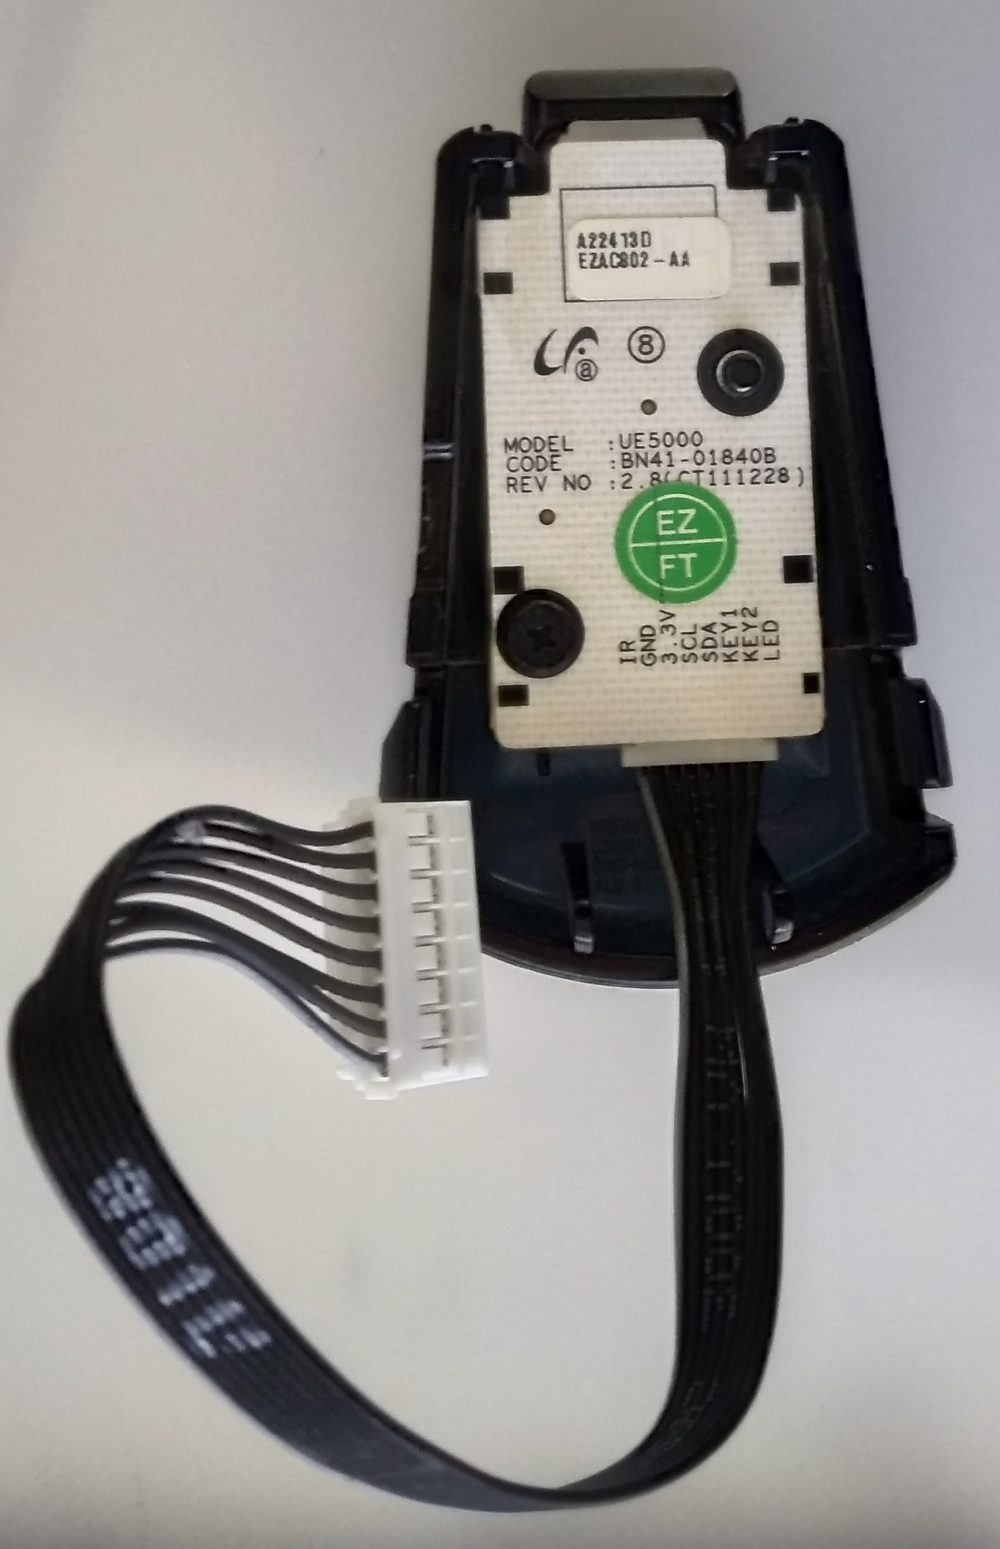 BN41-01840B - Ricevitore IR con switch function Samsung UE320EH5000W TV Modules